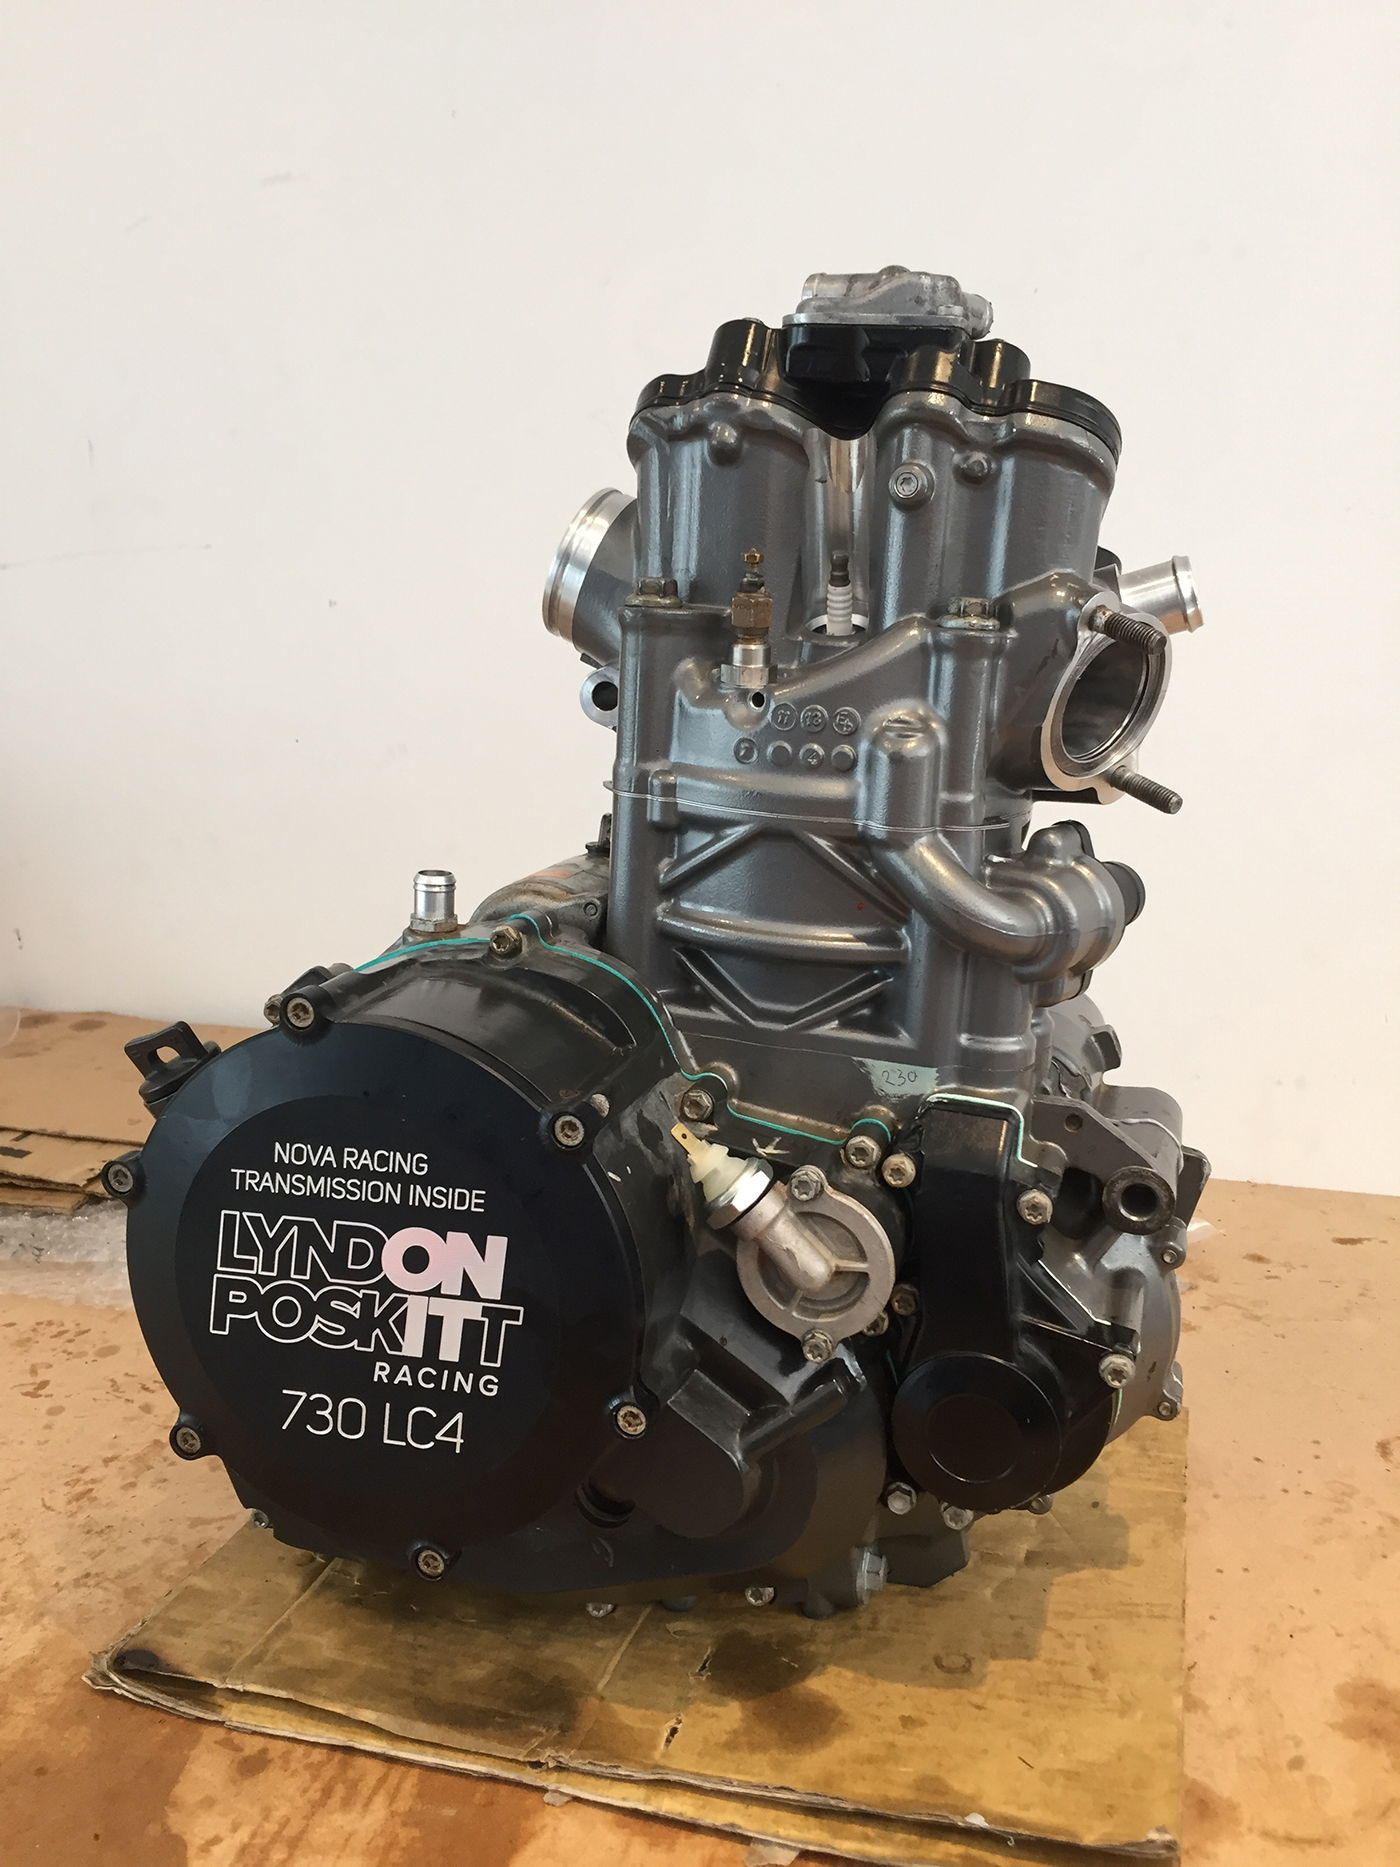 Ford engine repair houston thunderbolt transmissions for Thunderbolt motors and transmissions